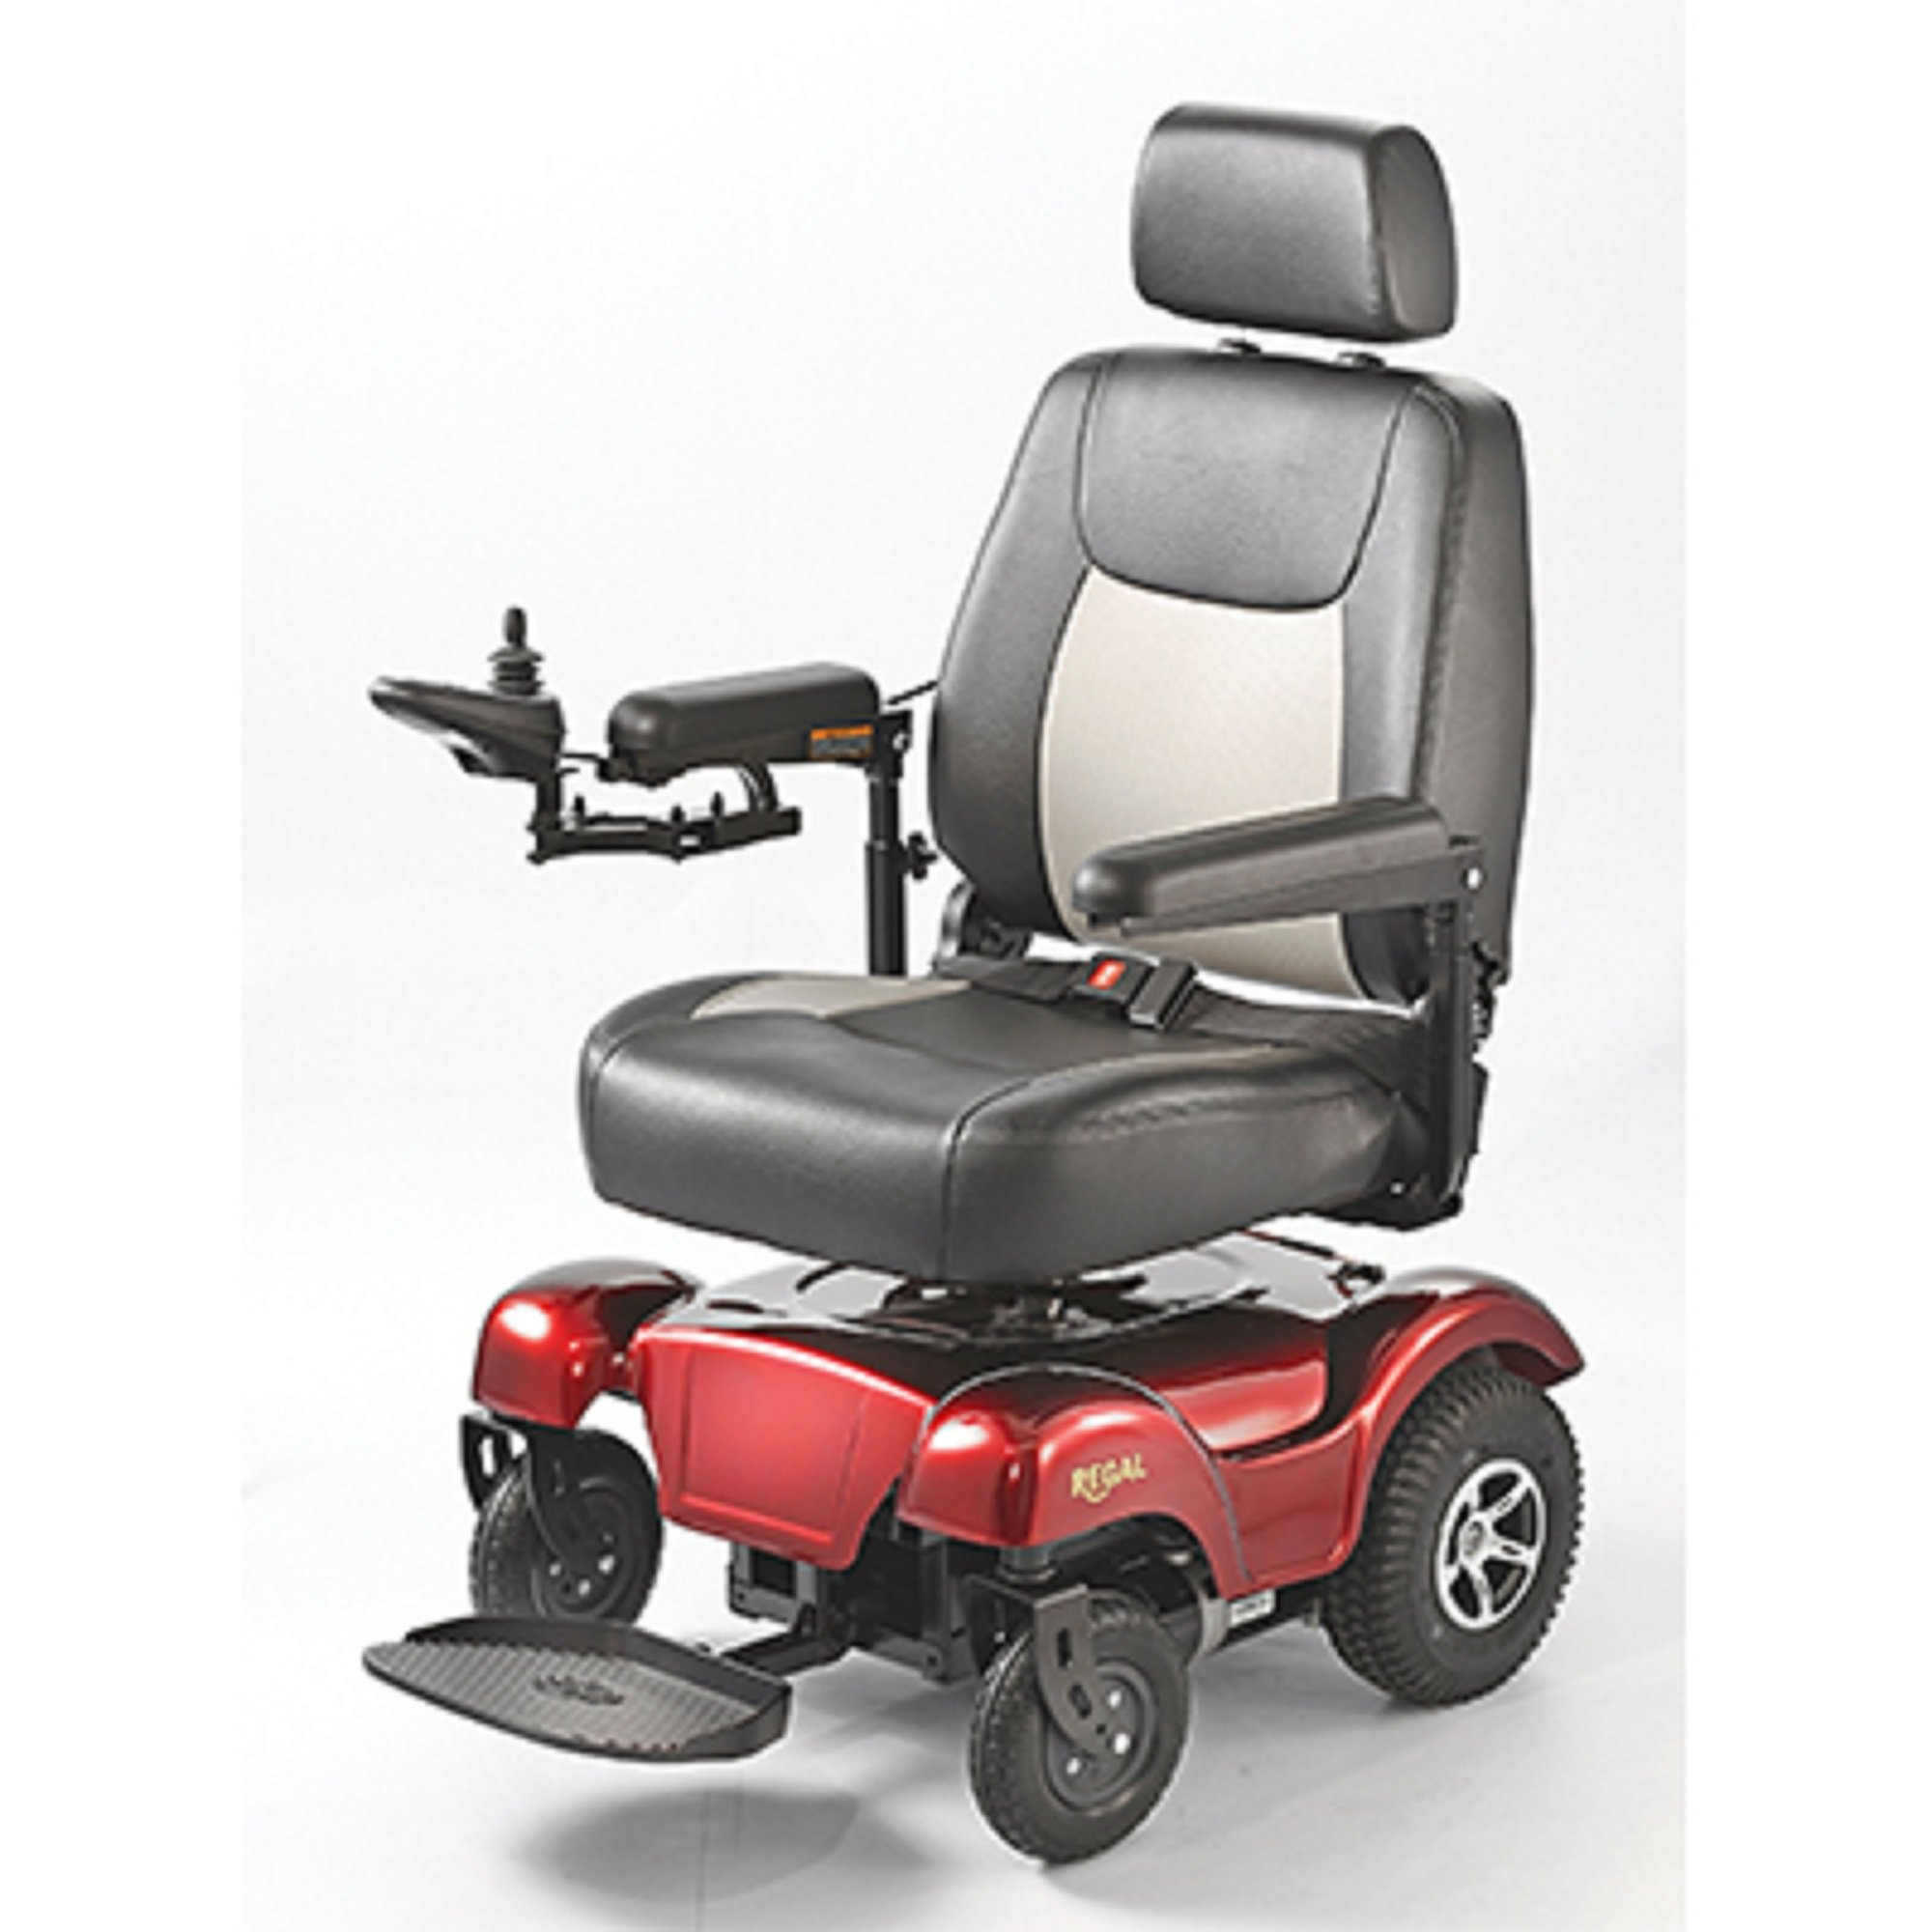 Merits Health Products - Regal - Rear Wheel Drive Power Chair - 20''W x 20''D - Red